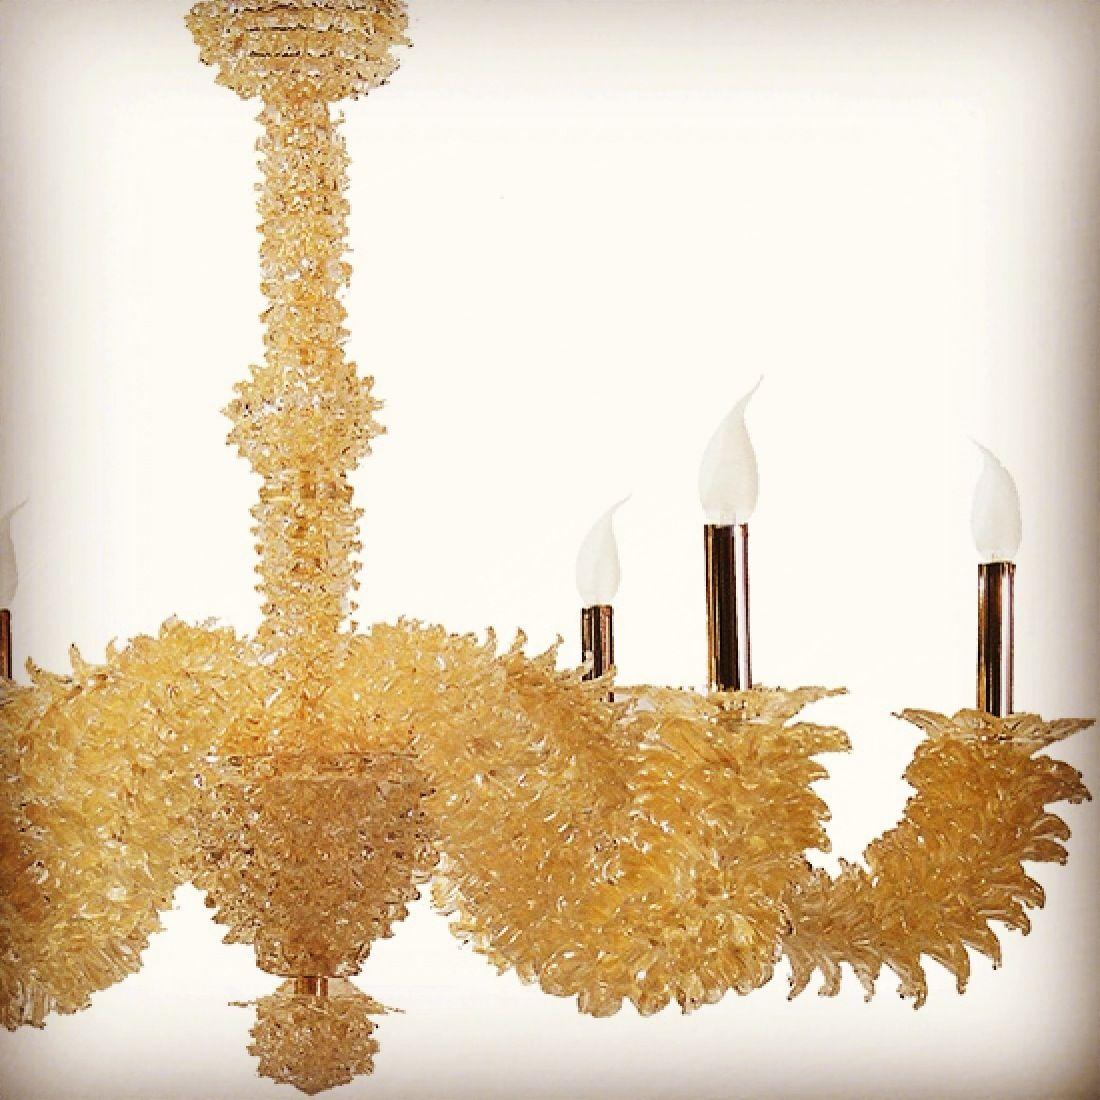 #muranoglass #handmade #artisan #venetianglass #elementsofdesign @lusivedecor